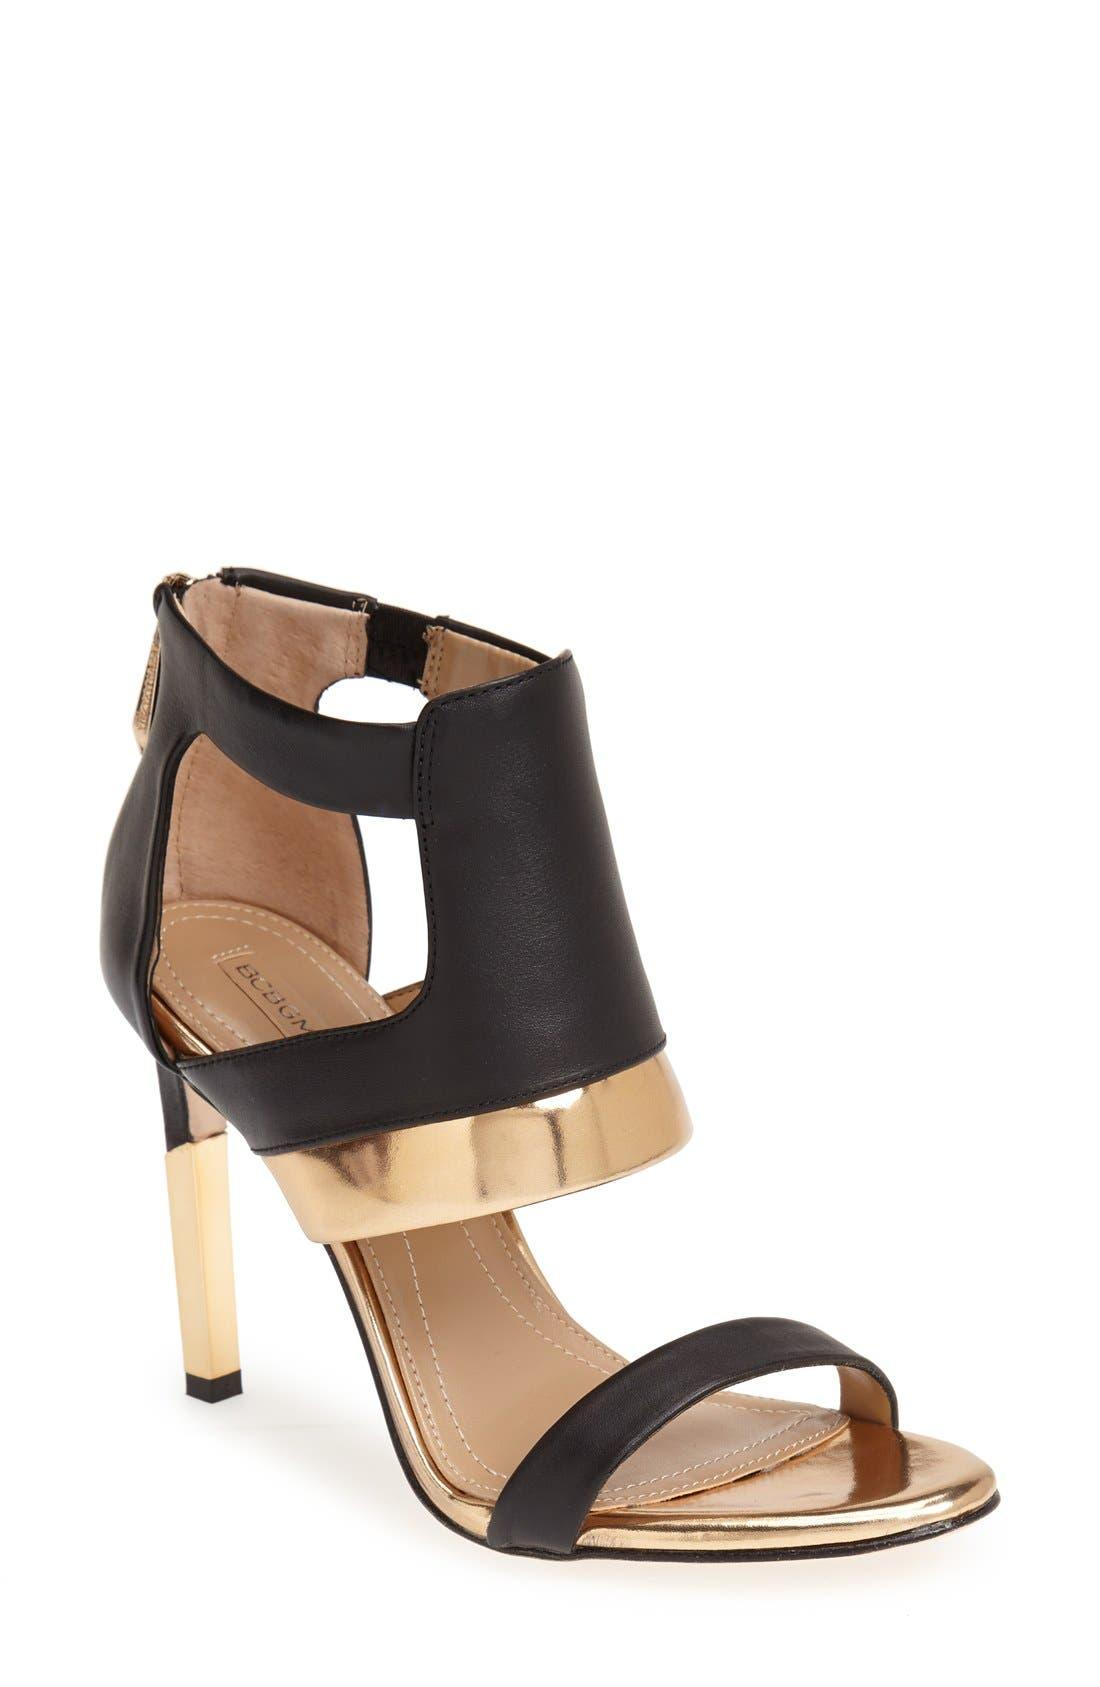 Main Image - BCBGMAXAZRIA 'Jetss' Sandal (Women)